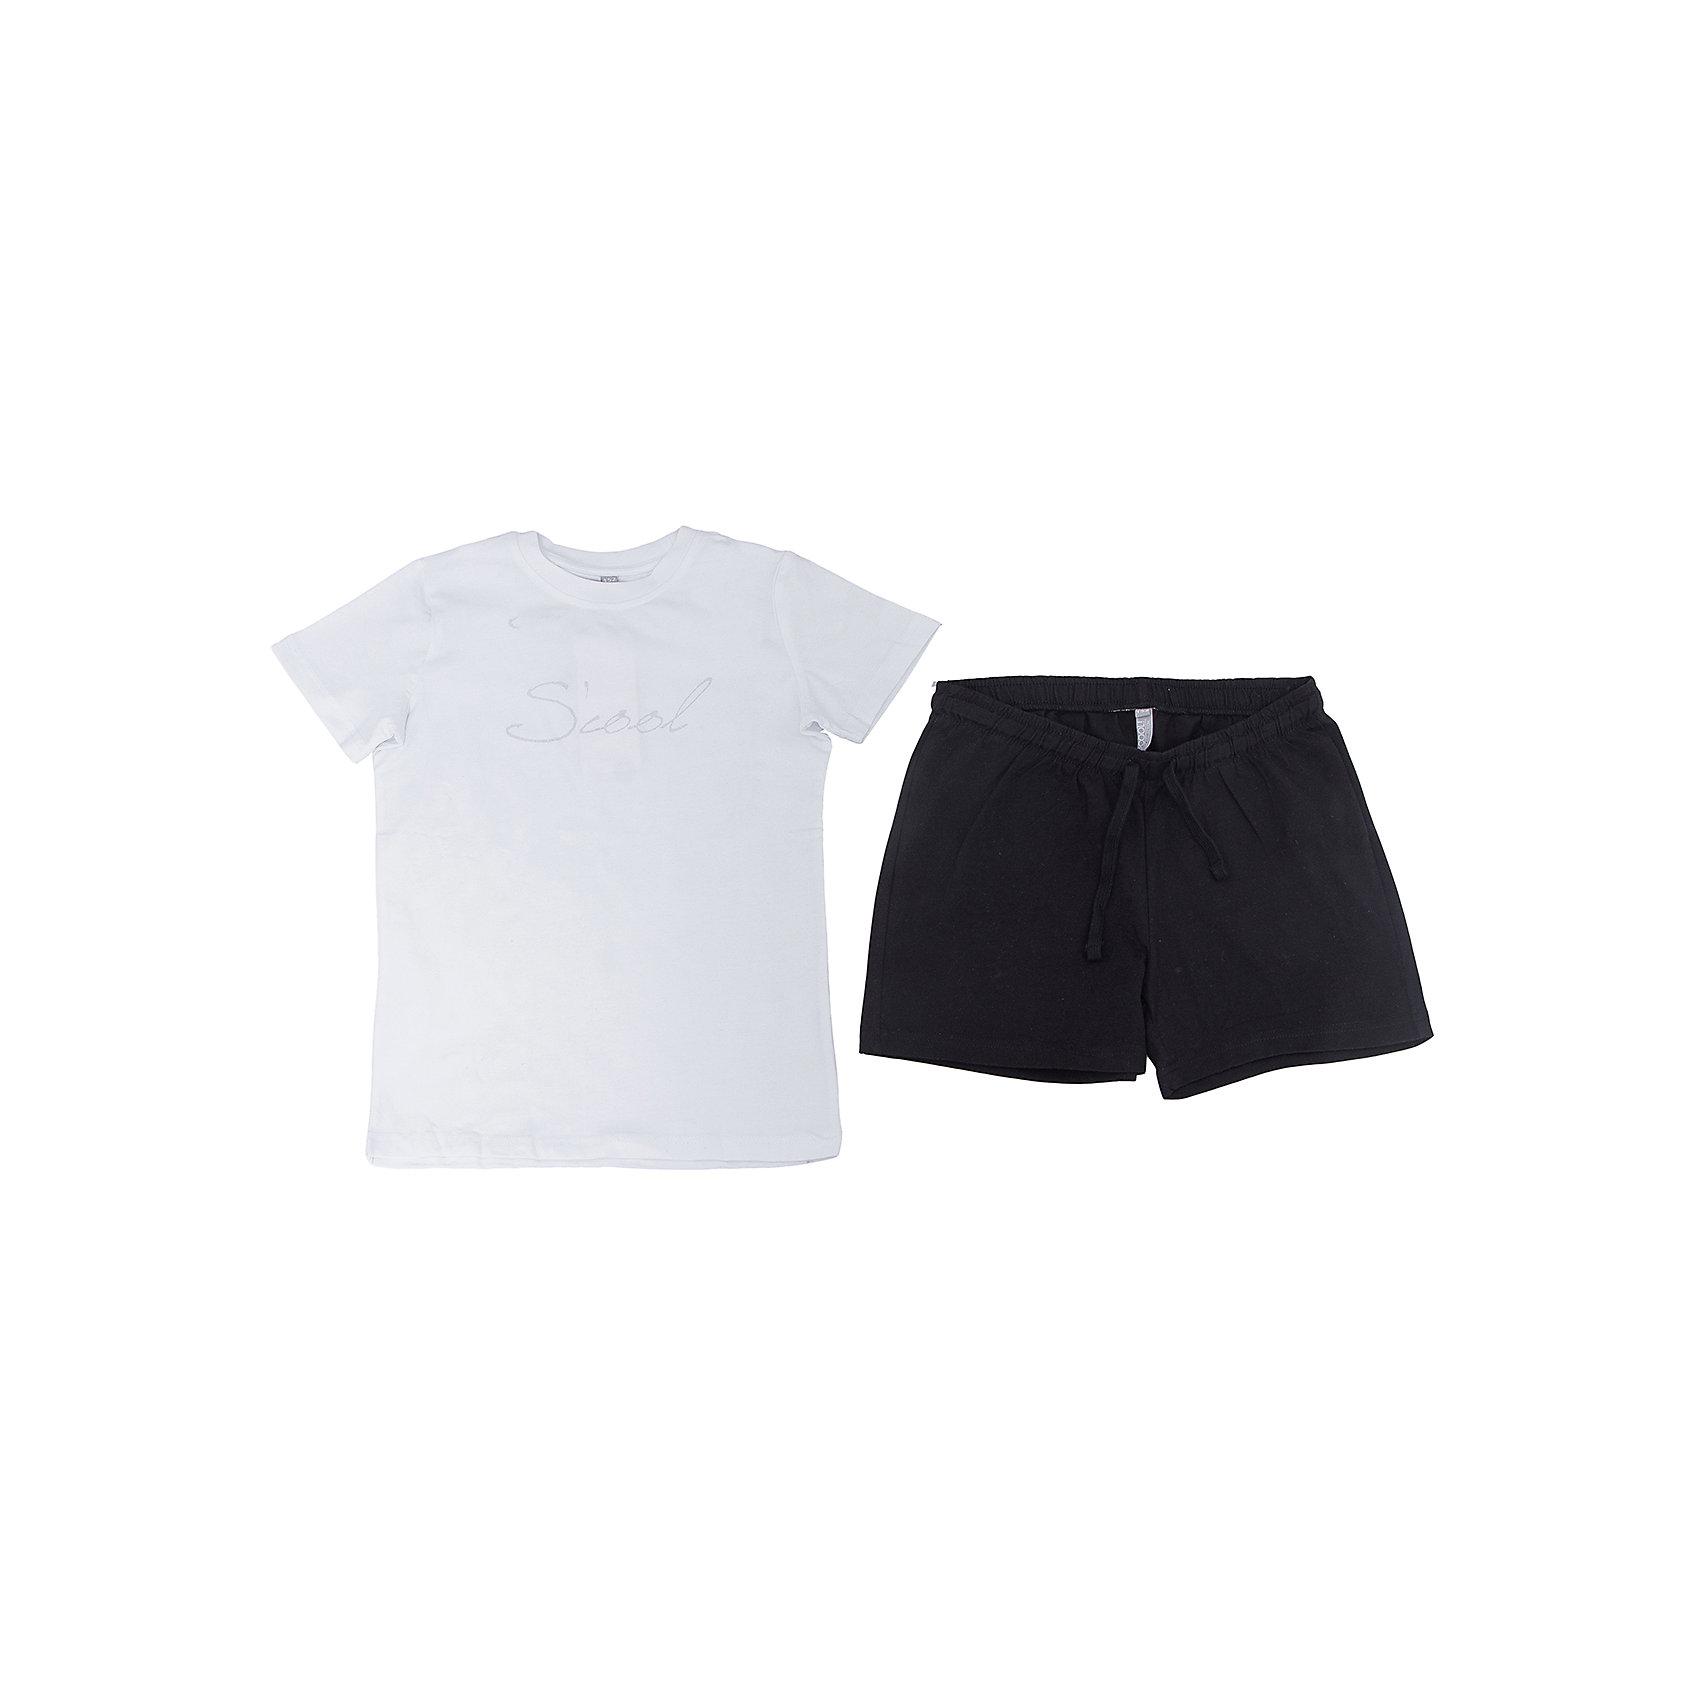 S'cool Комплект: футболка и шорты для девочки S'cool